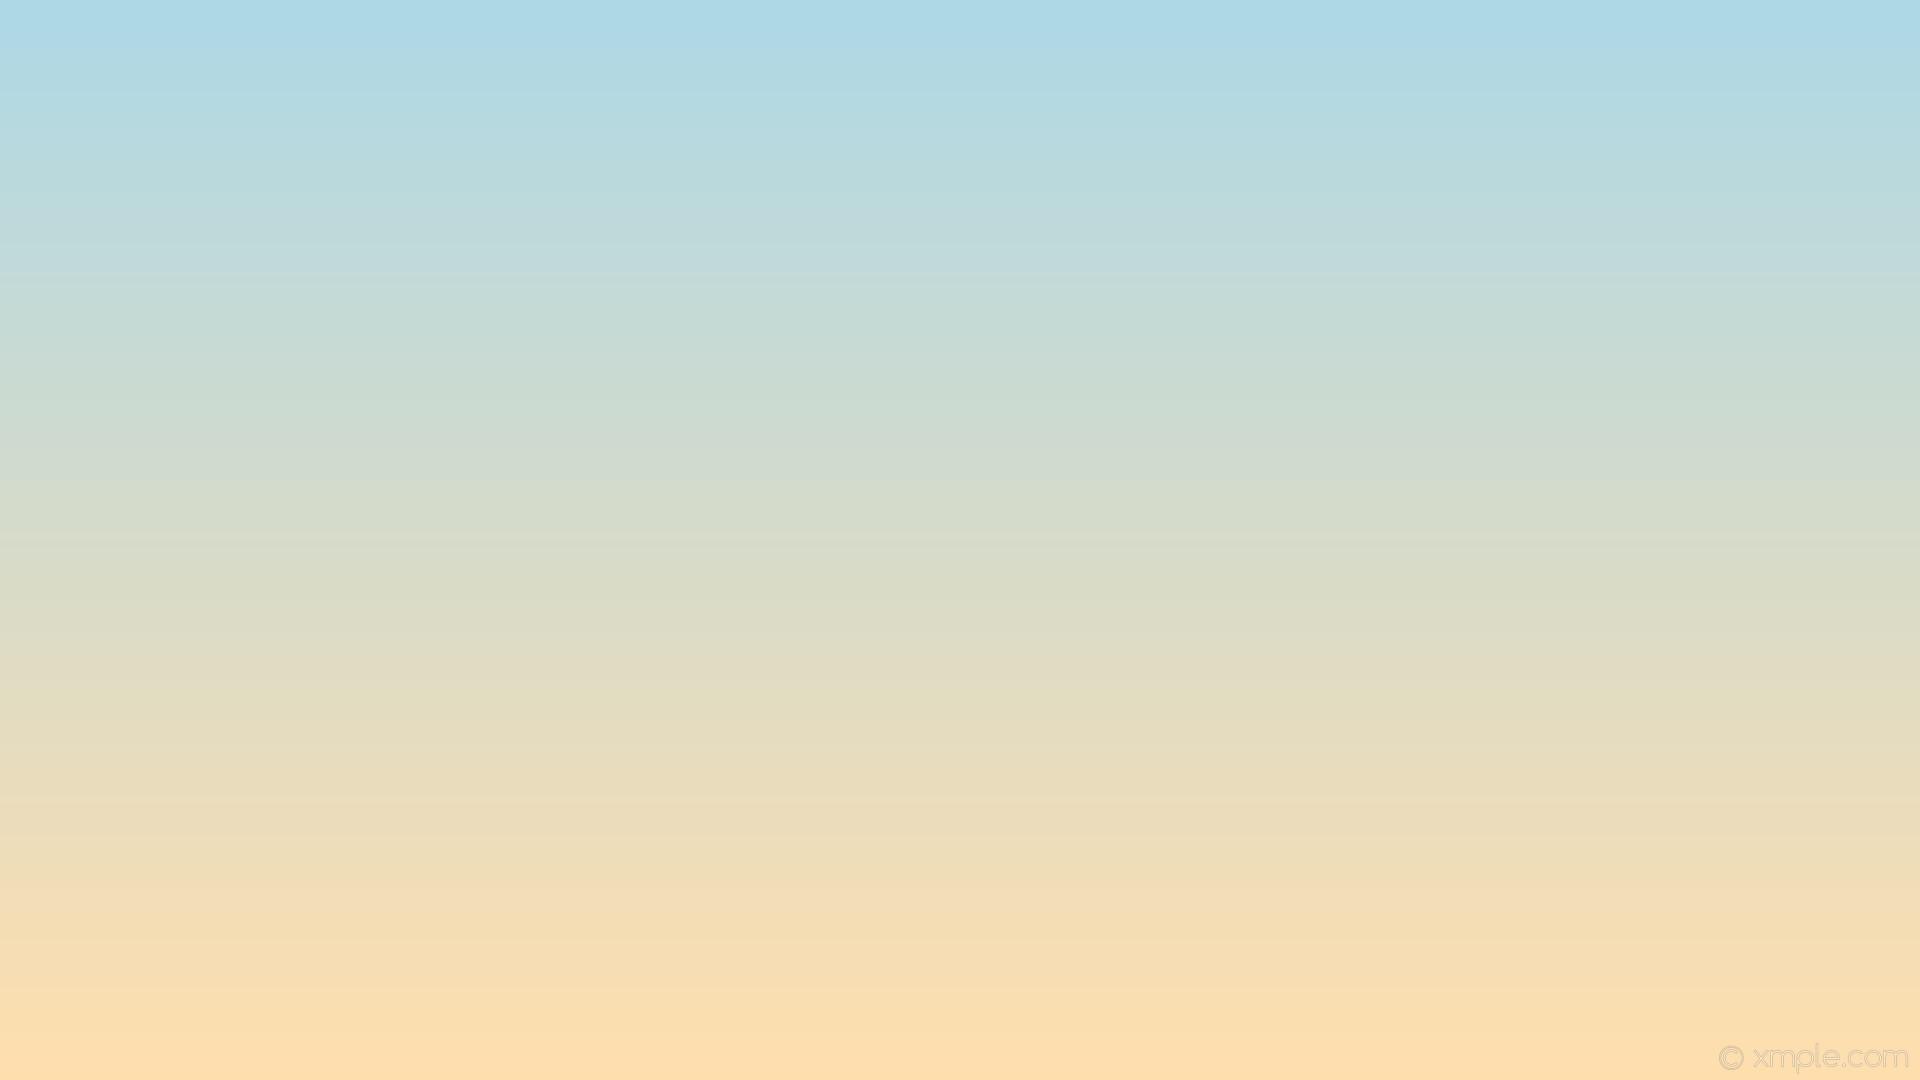 wallpaper brown blue gradient linear light blue navajo white #add8e6  #ffdead 90°